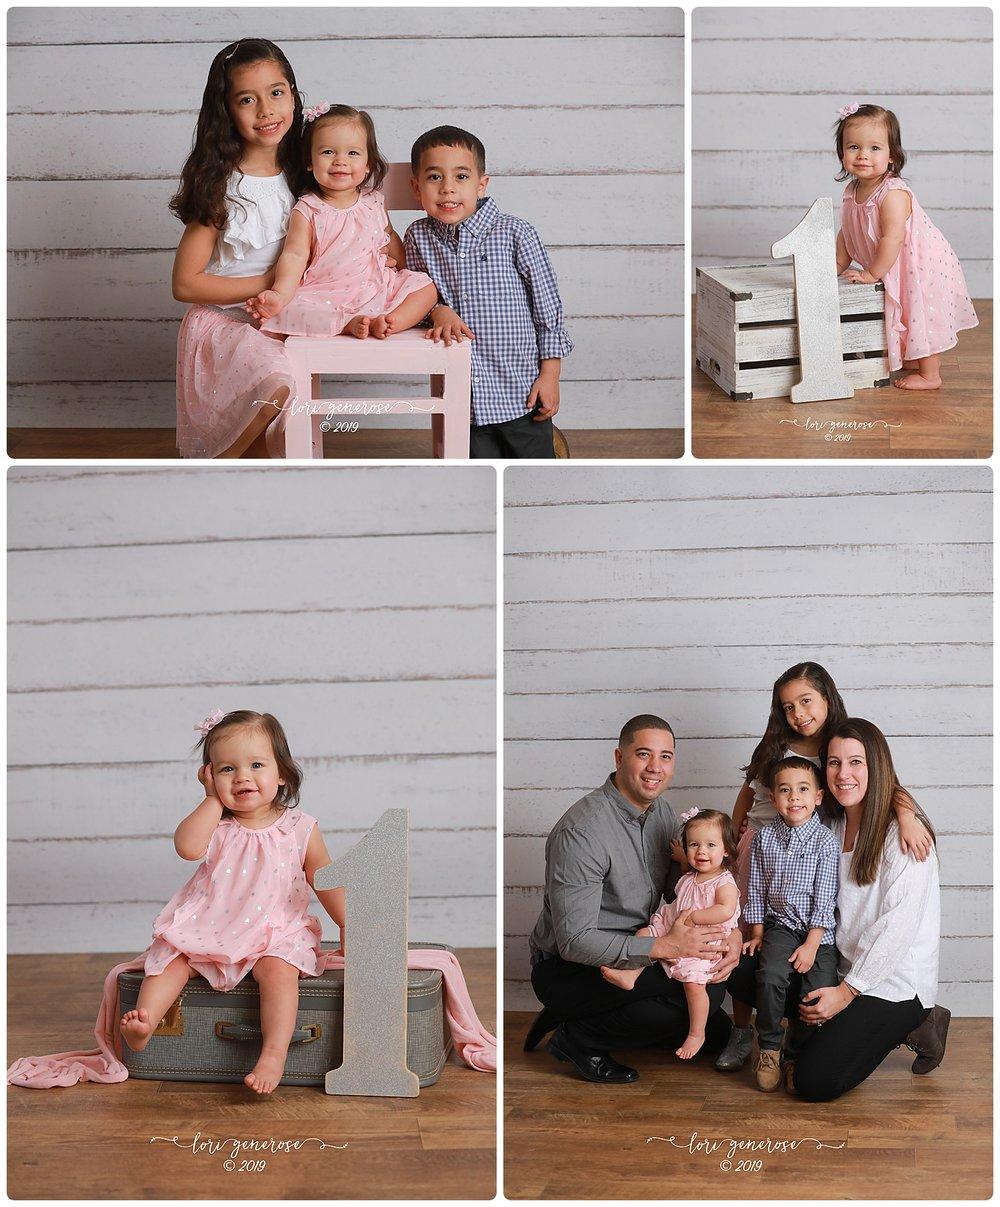 lgphotographylorigenerosewhiteshiplapbackdropfirstbirthdaygirlwithsinlingsandfamilycakesmashgirl.jpg